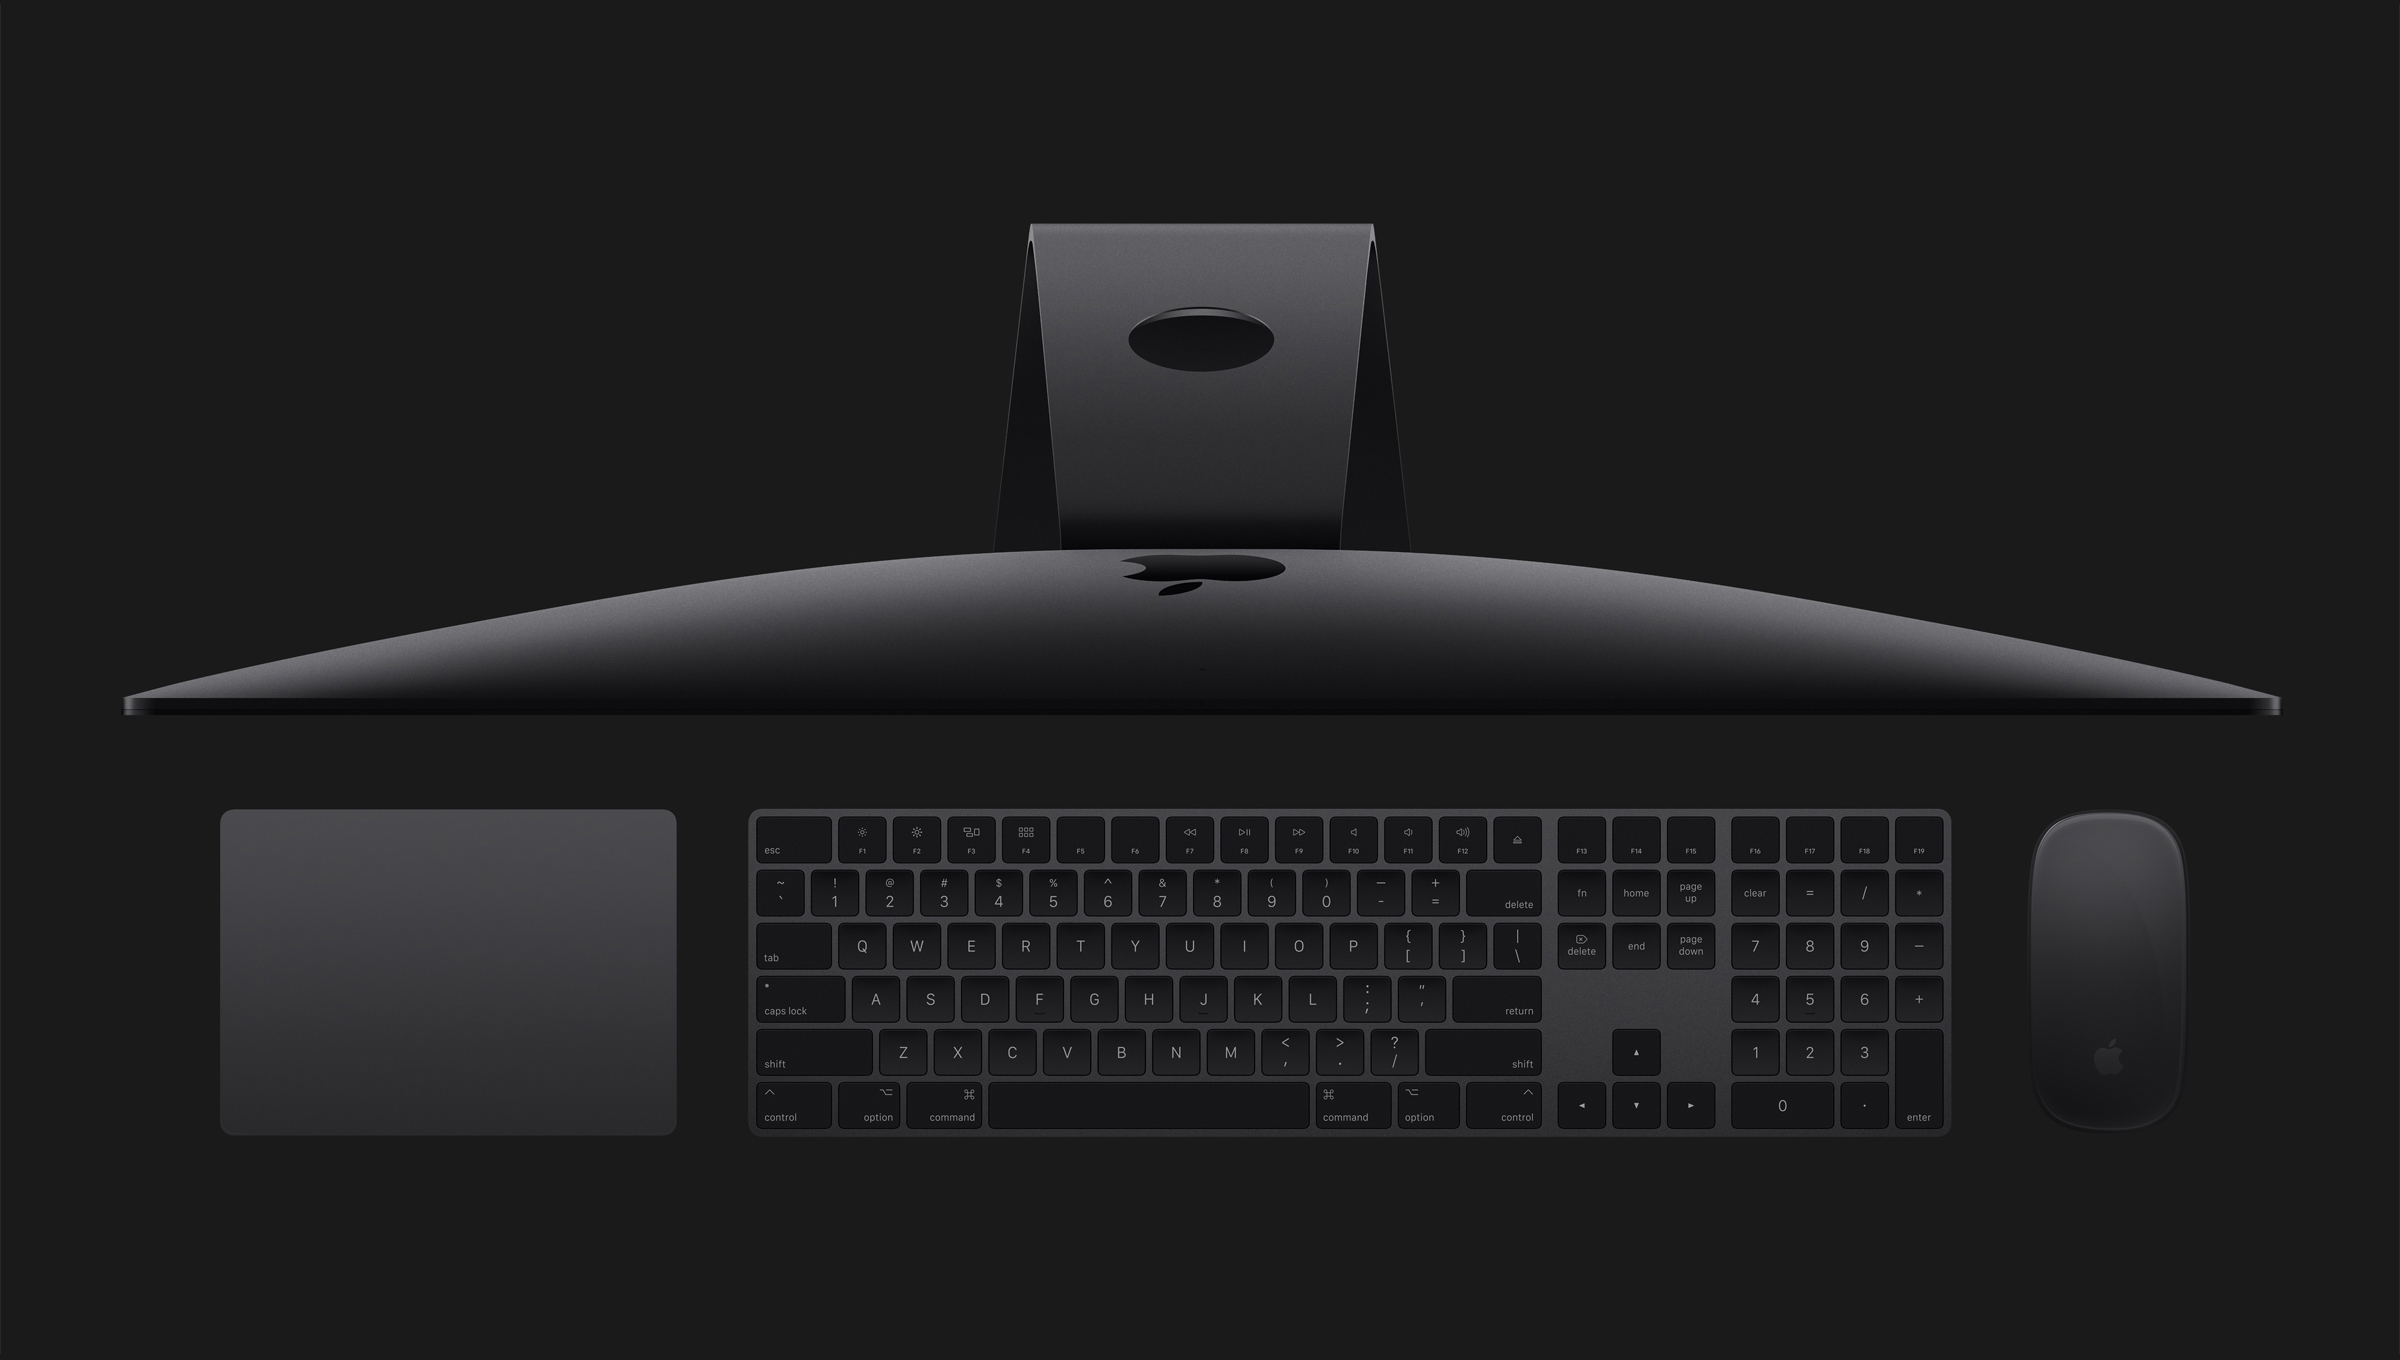 Apple Reveals The New iMac Pro - 18-core CPU & 4TB SSD